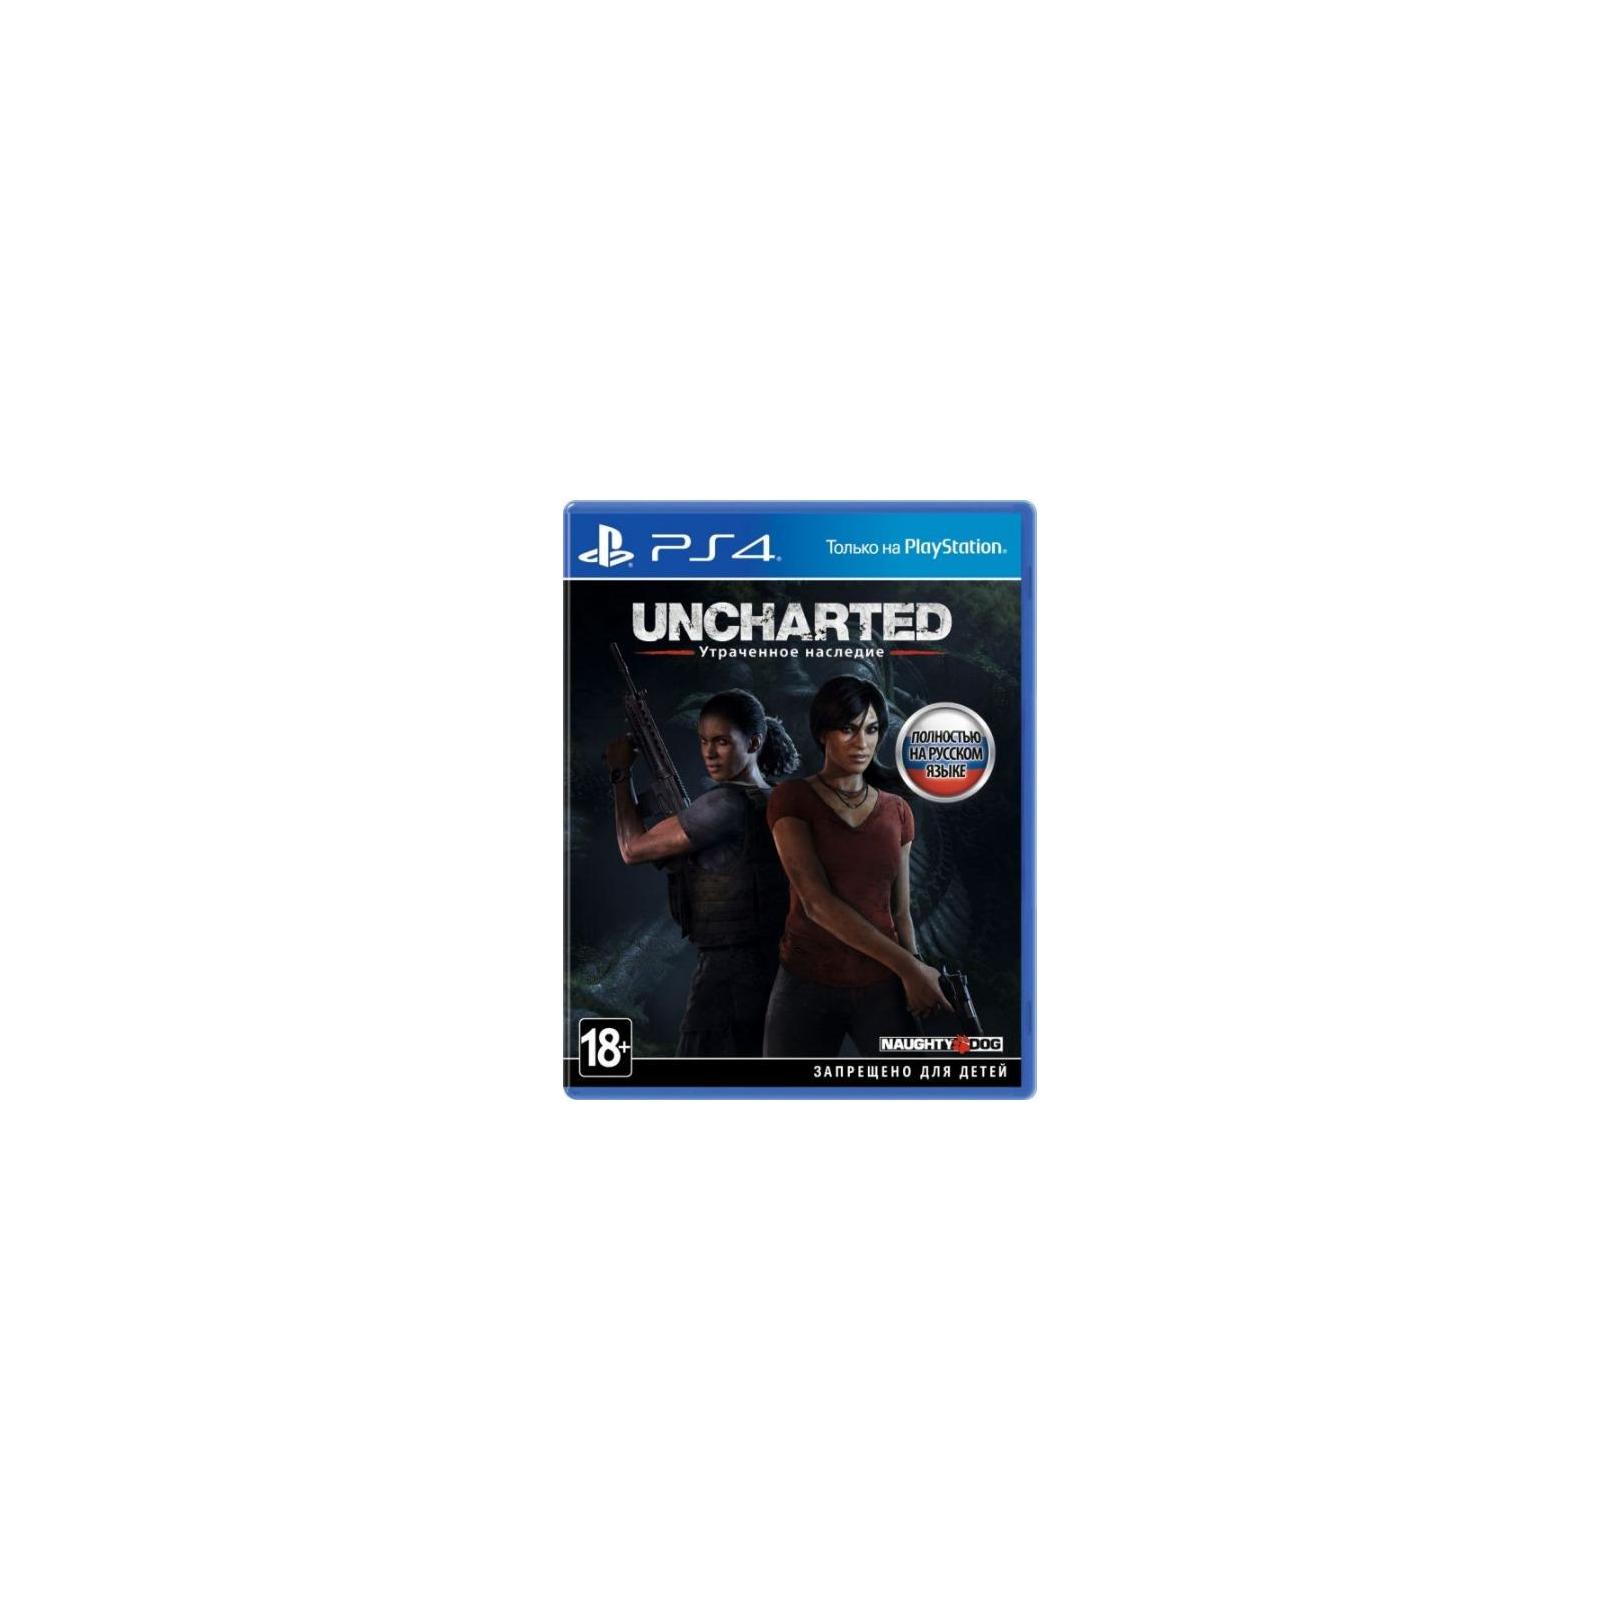 Игра SONY Uncharted: Утраченное наследие [PS4, Russian version] (9879862)